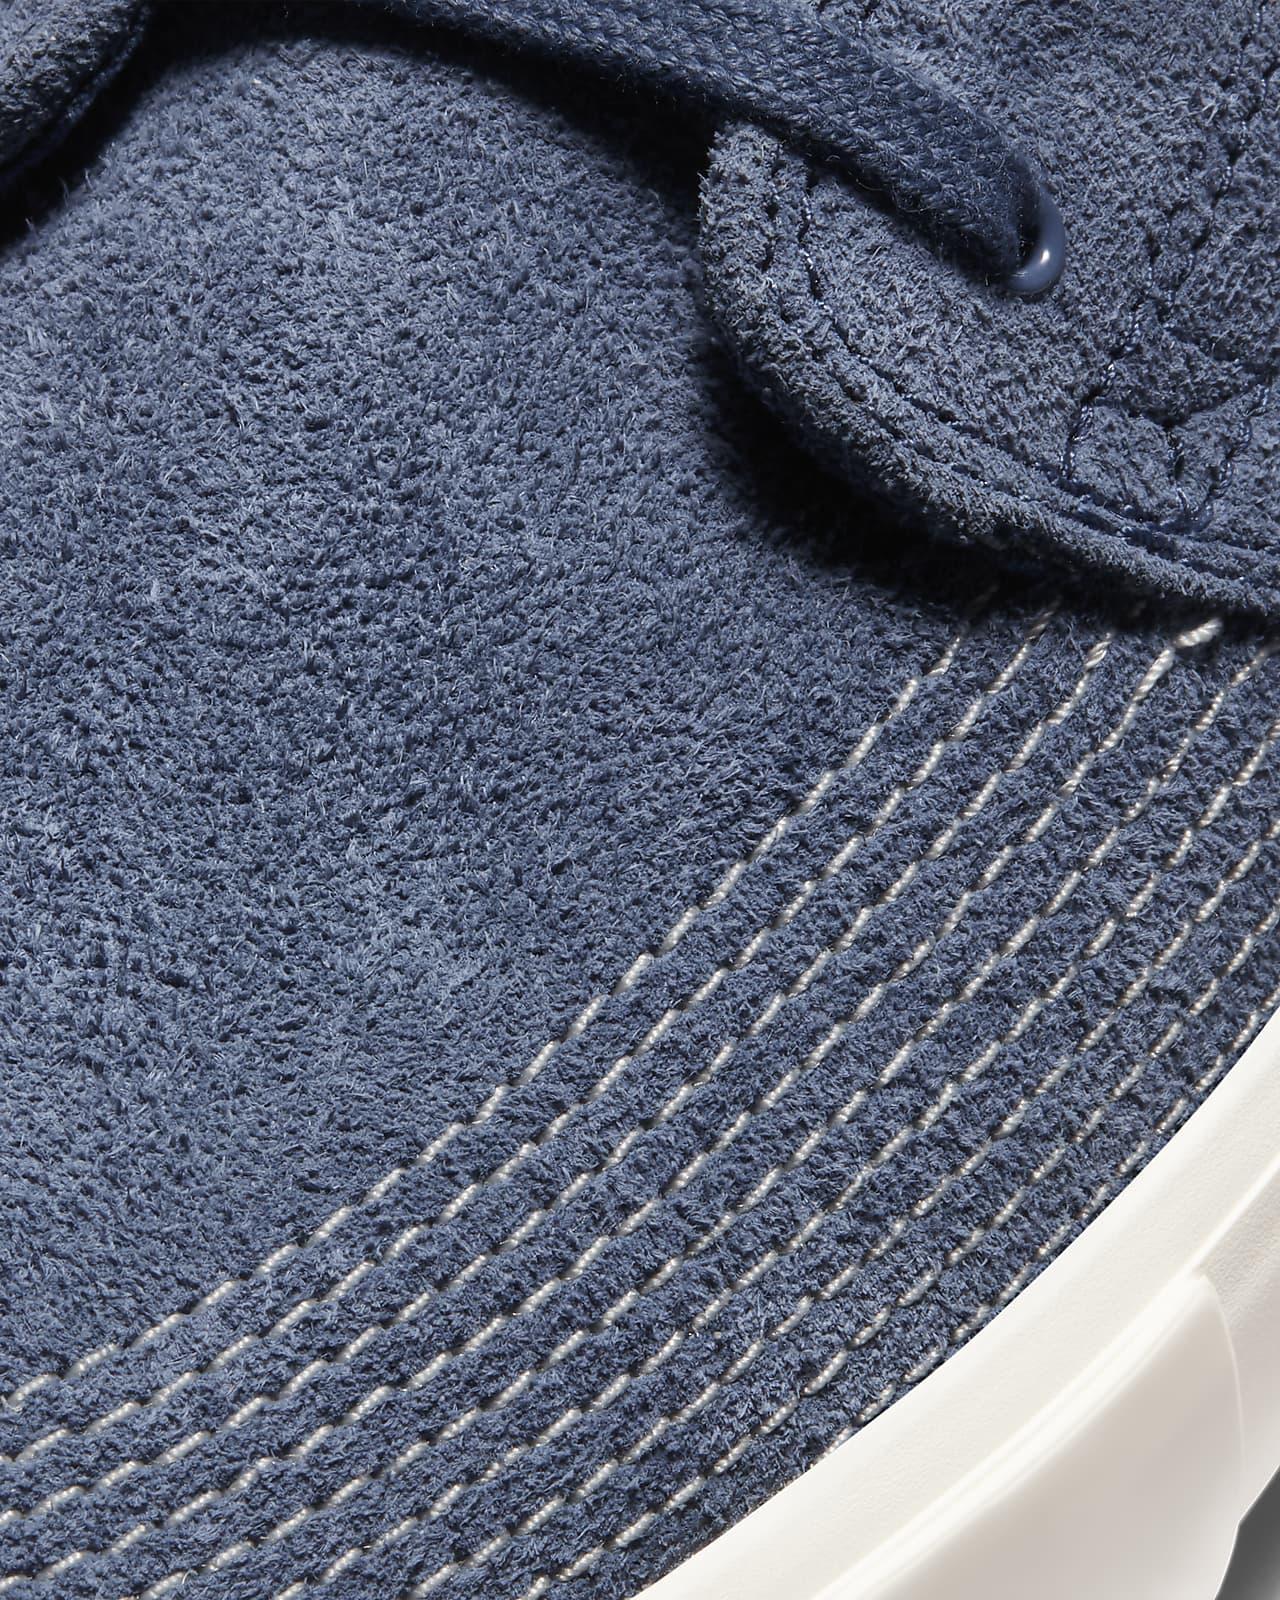 bañera encuesta formal  Nike SB Zoom Stefan Janoski RM Premium Skate Shoe. Nike LU